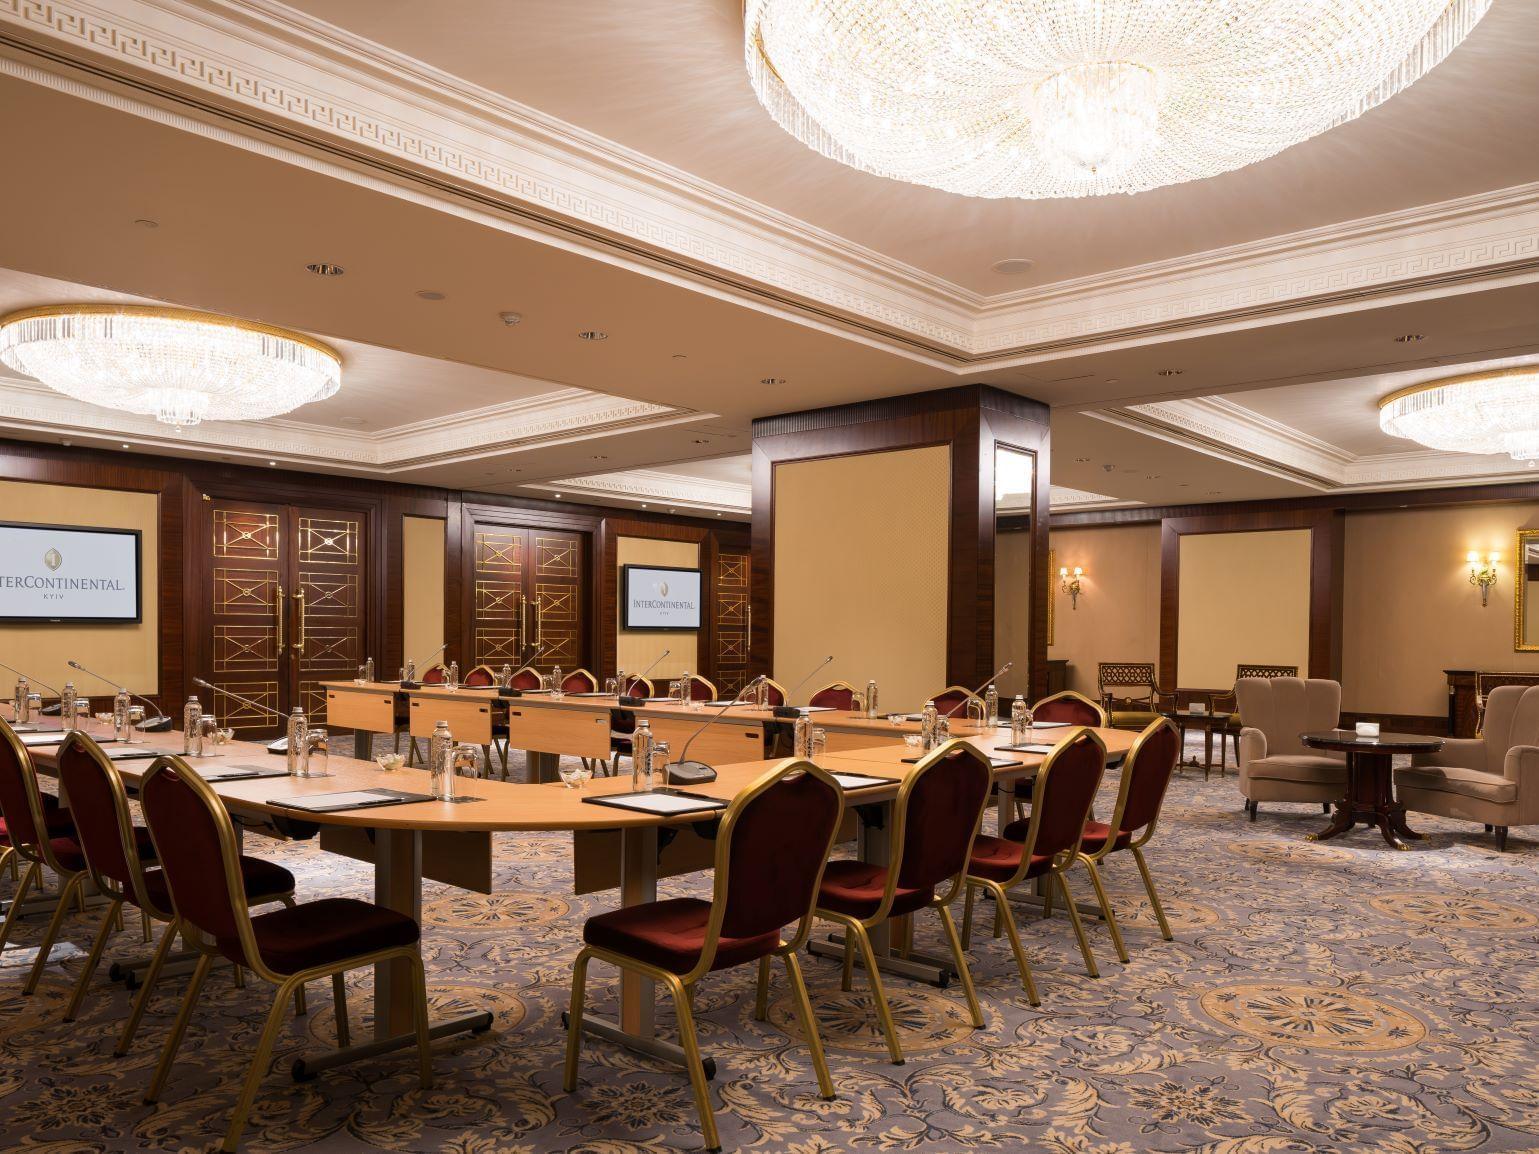 Zoloti Vorota  Conference hall at Intercontinental Kyiv hotel